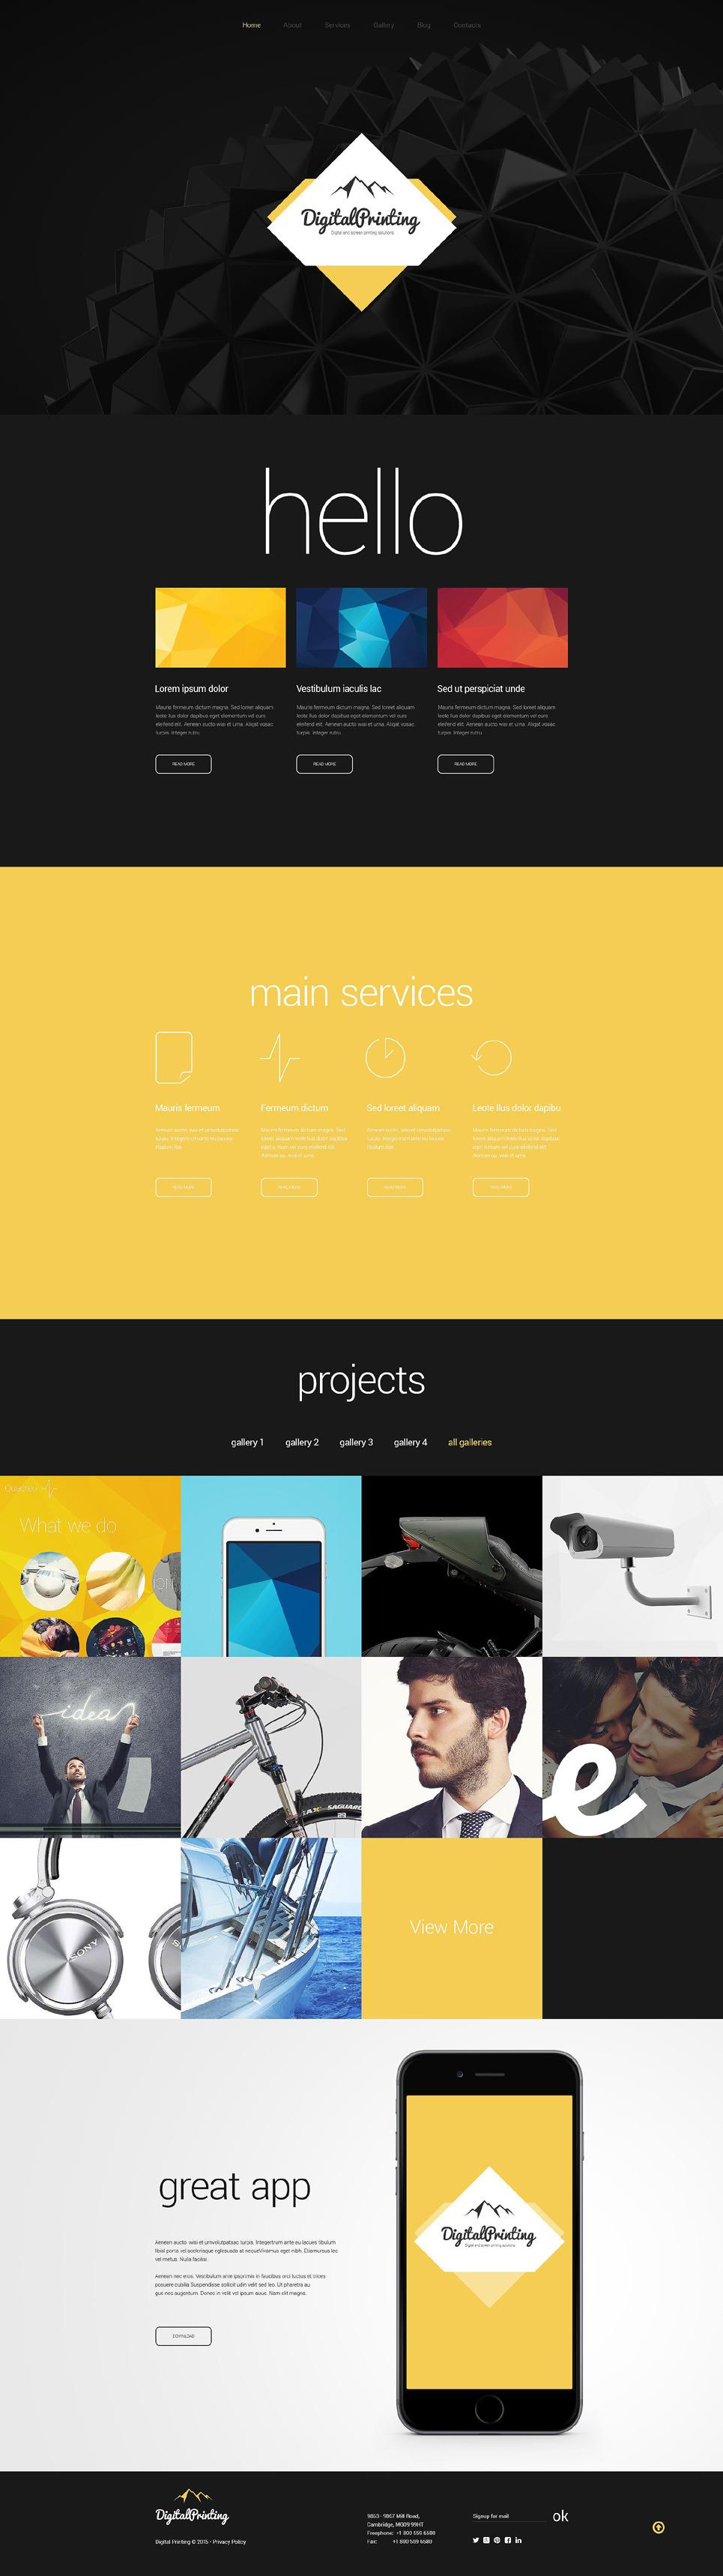 Digital Printing Website Template New Screenshots BIG